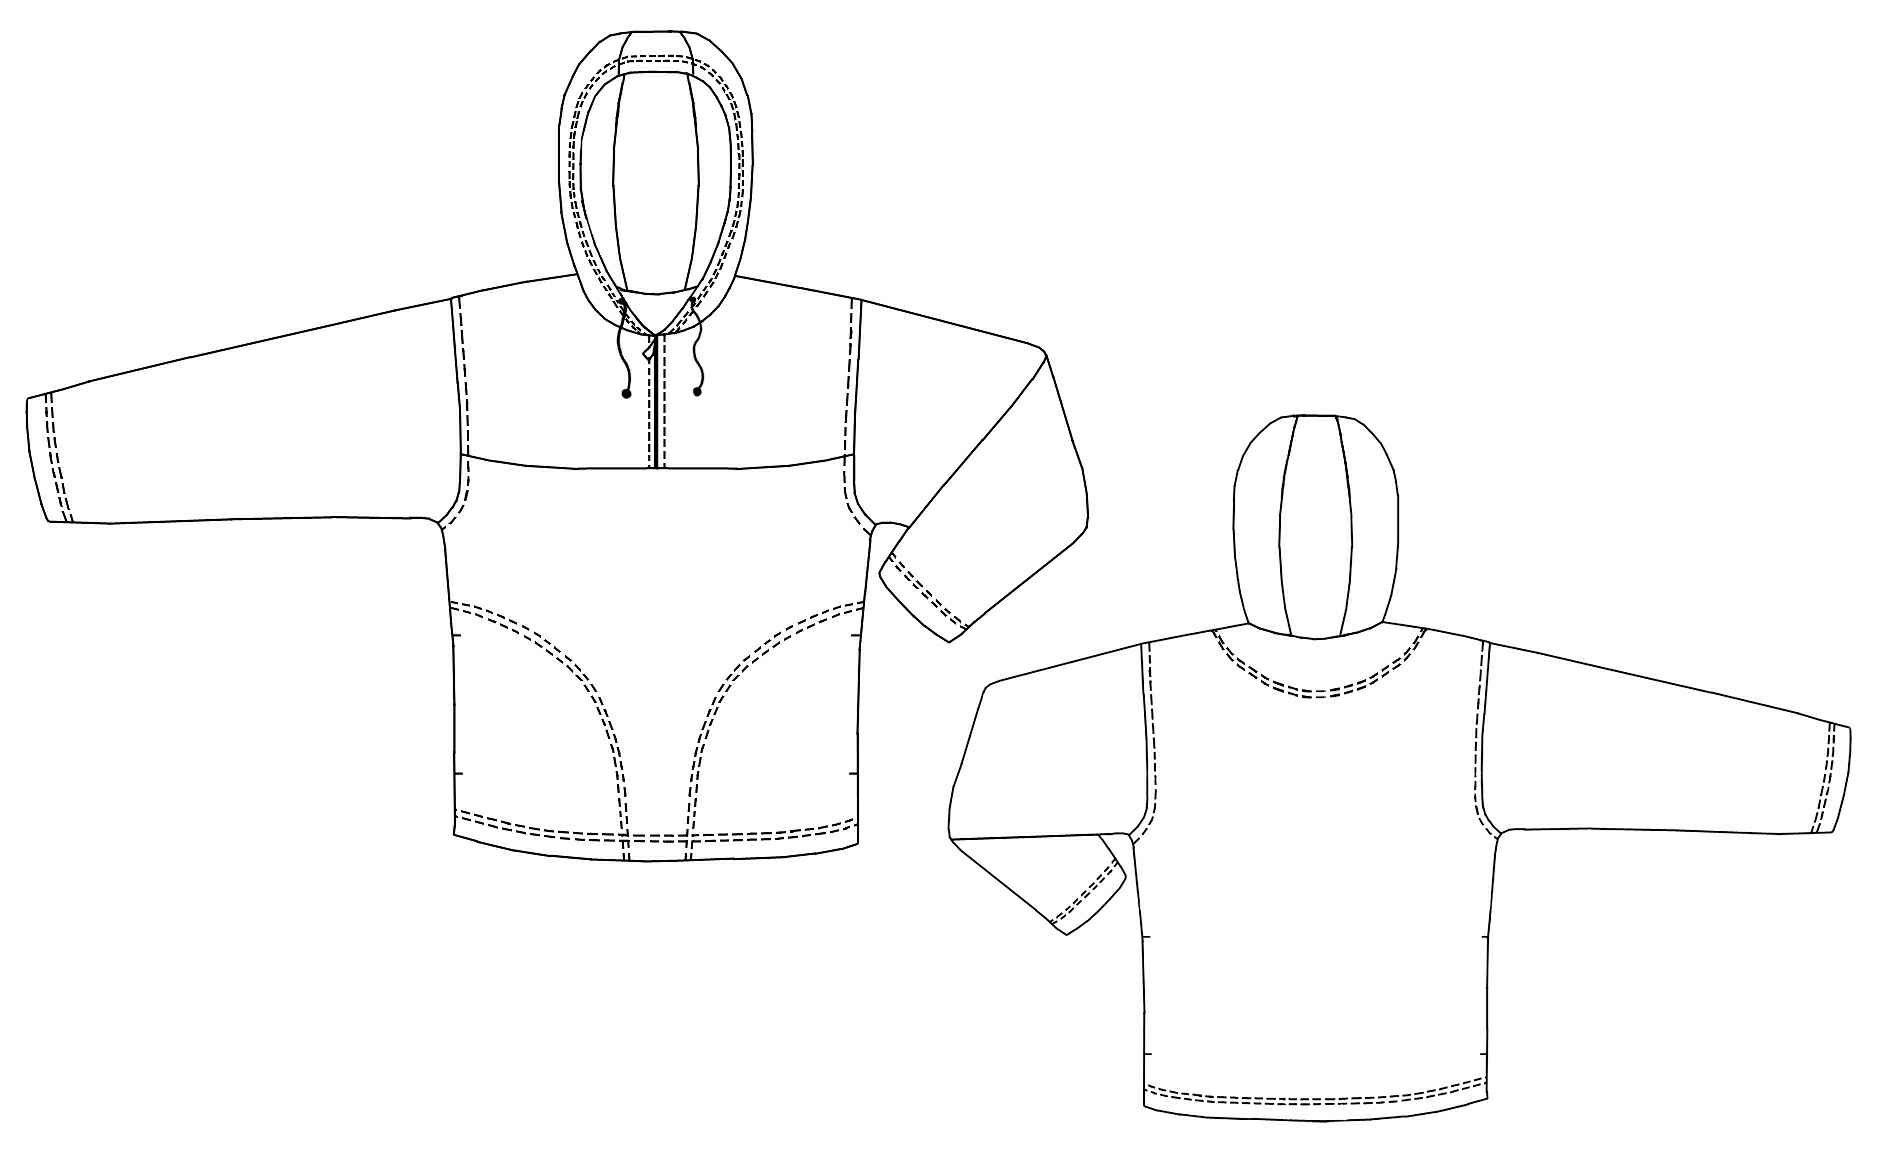 Hooded Sweatshirt - Sewing Pattern #6102. Made-to-measure sewing ...